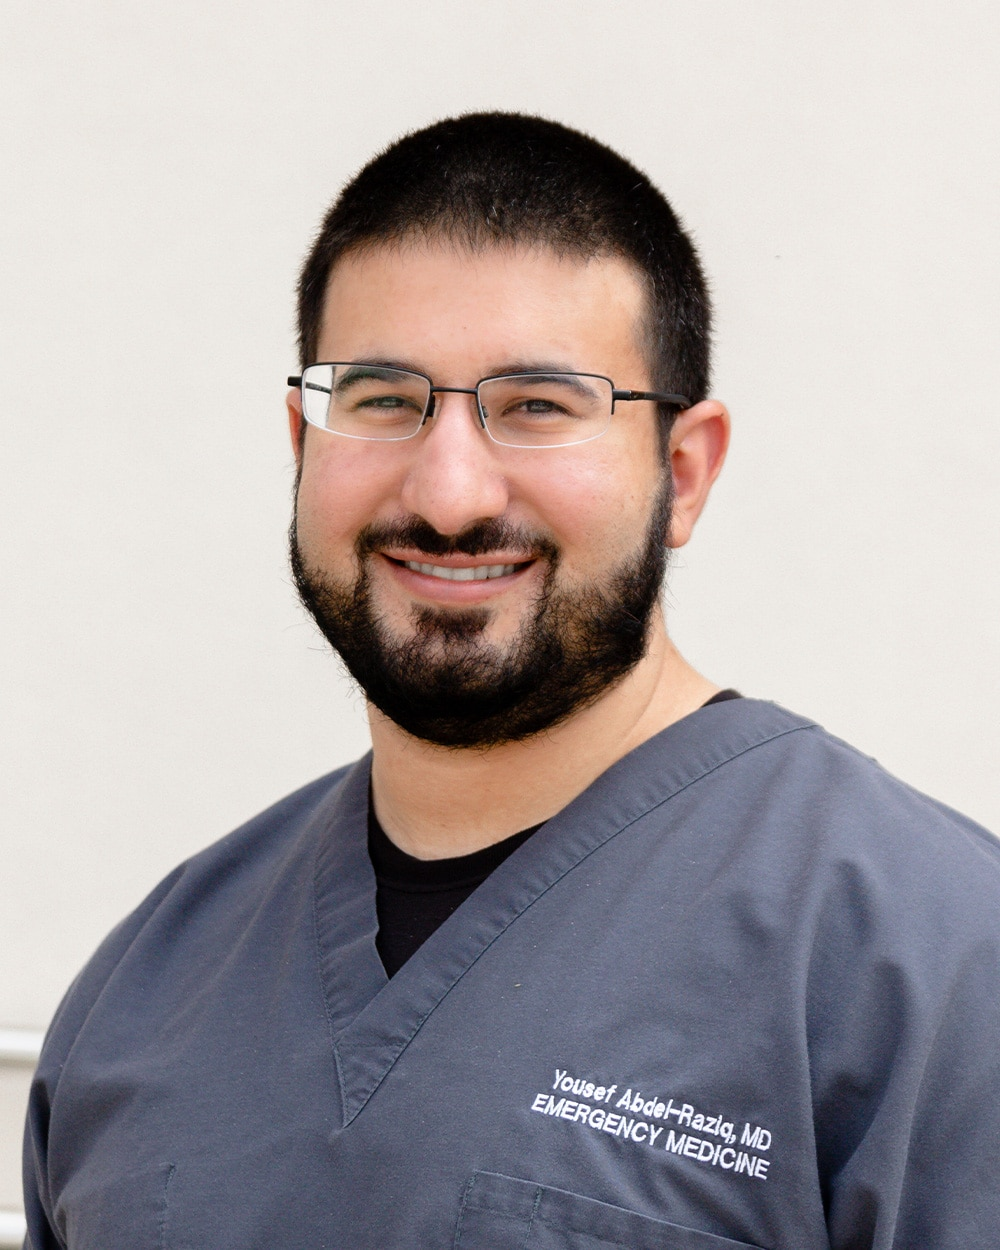 yousef abdel raziq md - Fort Worth EM Residency Program